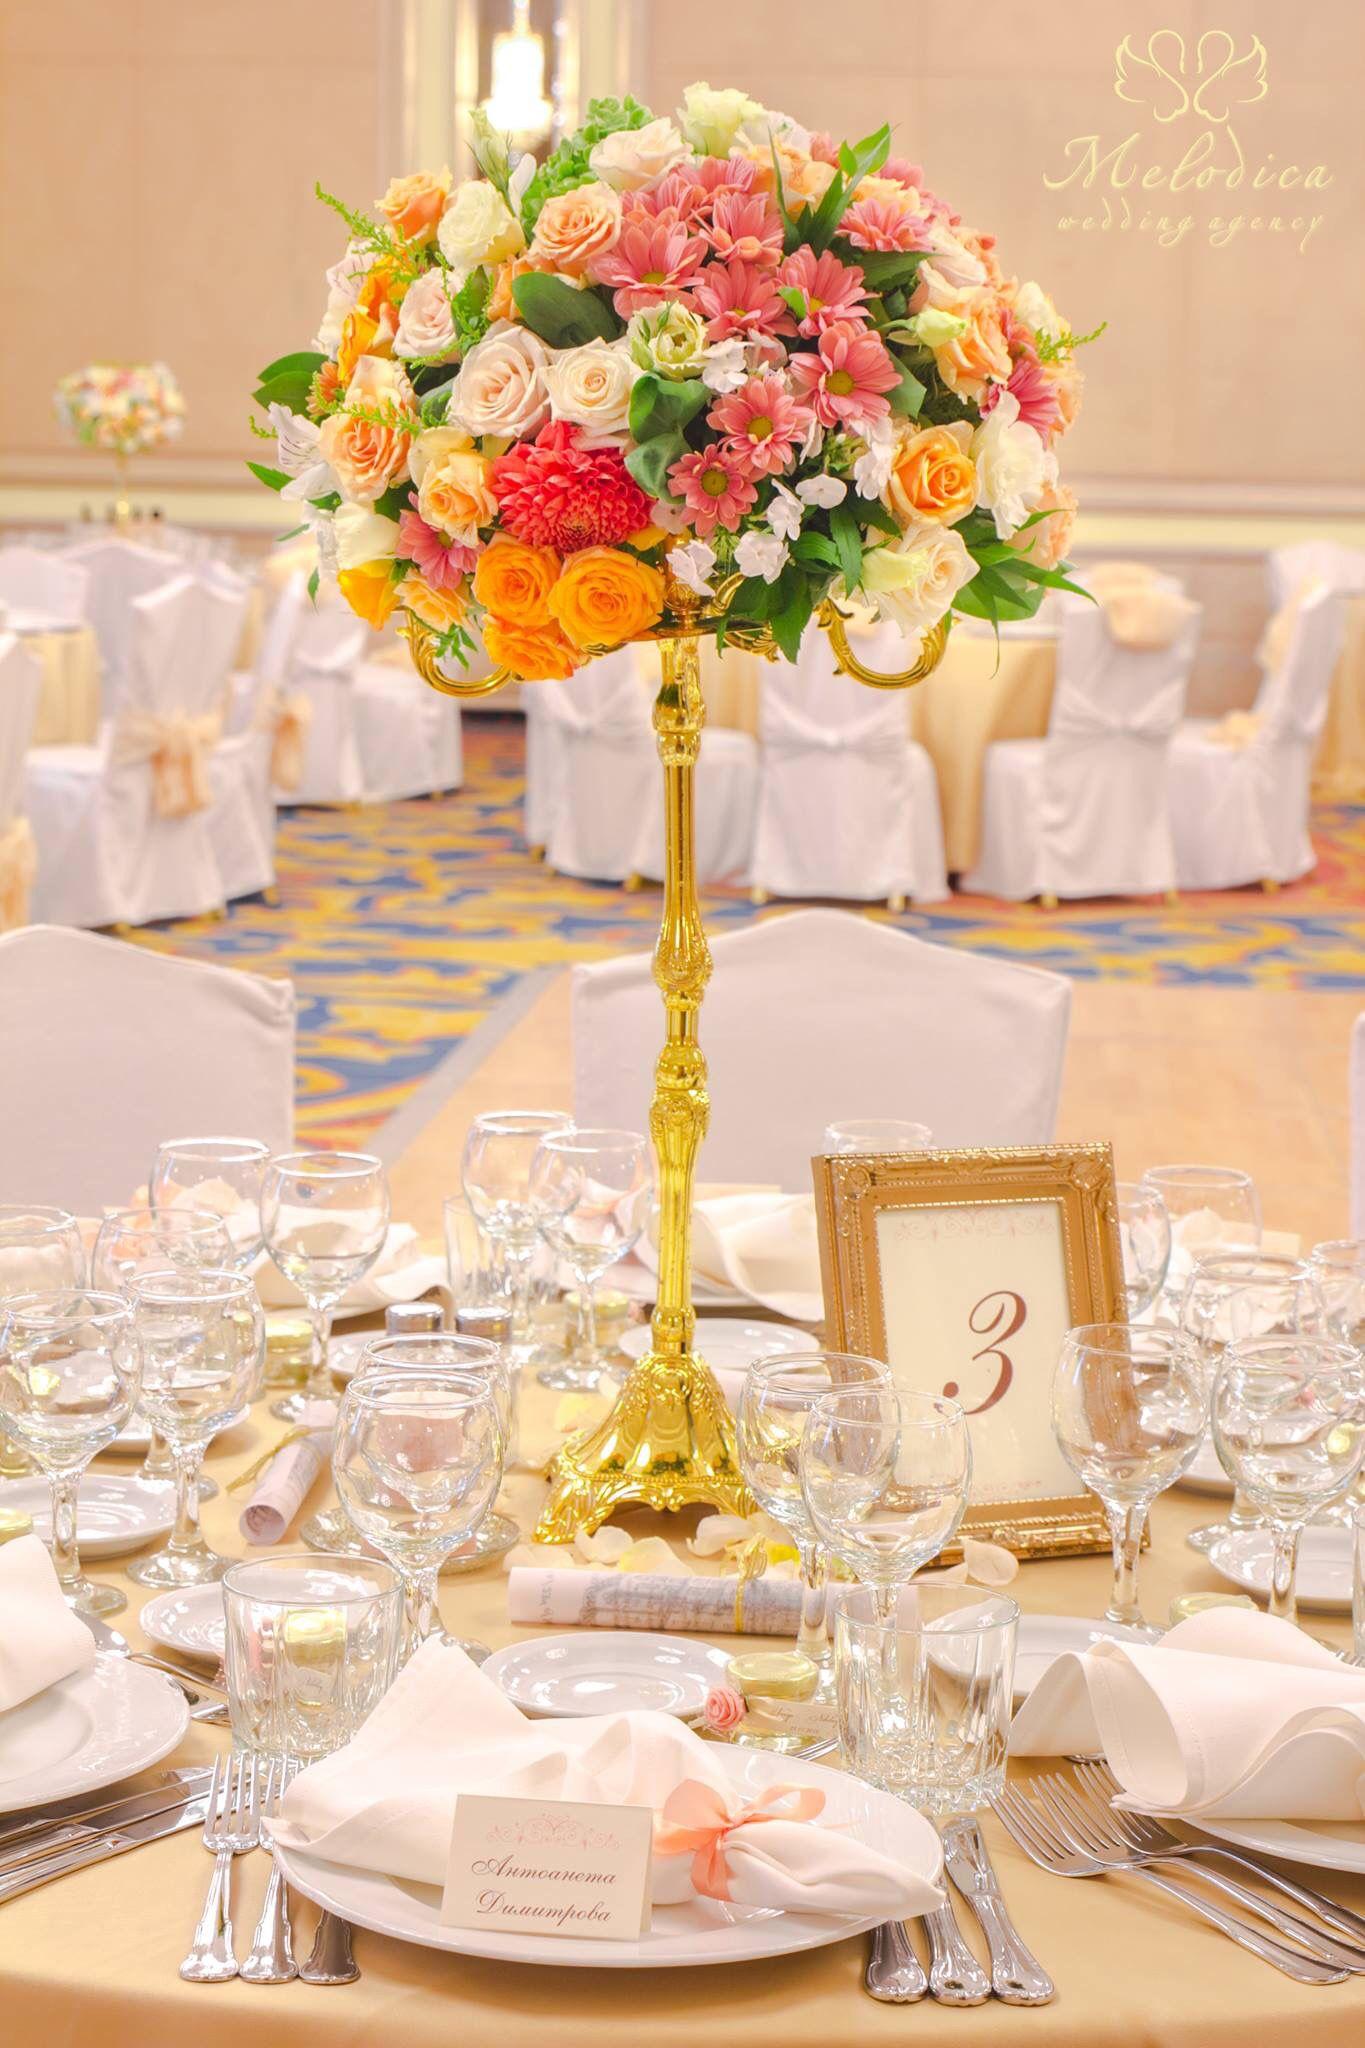 Classical wedding decoration by melodica wedding agency wedding classical wedding decoration by melodica wedding agency wedding weddingdecoration weddingagency junglespirit Gallery